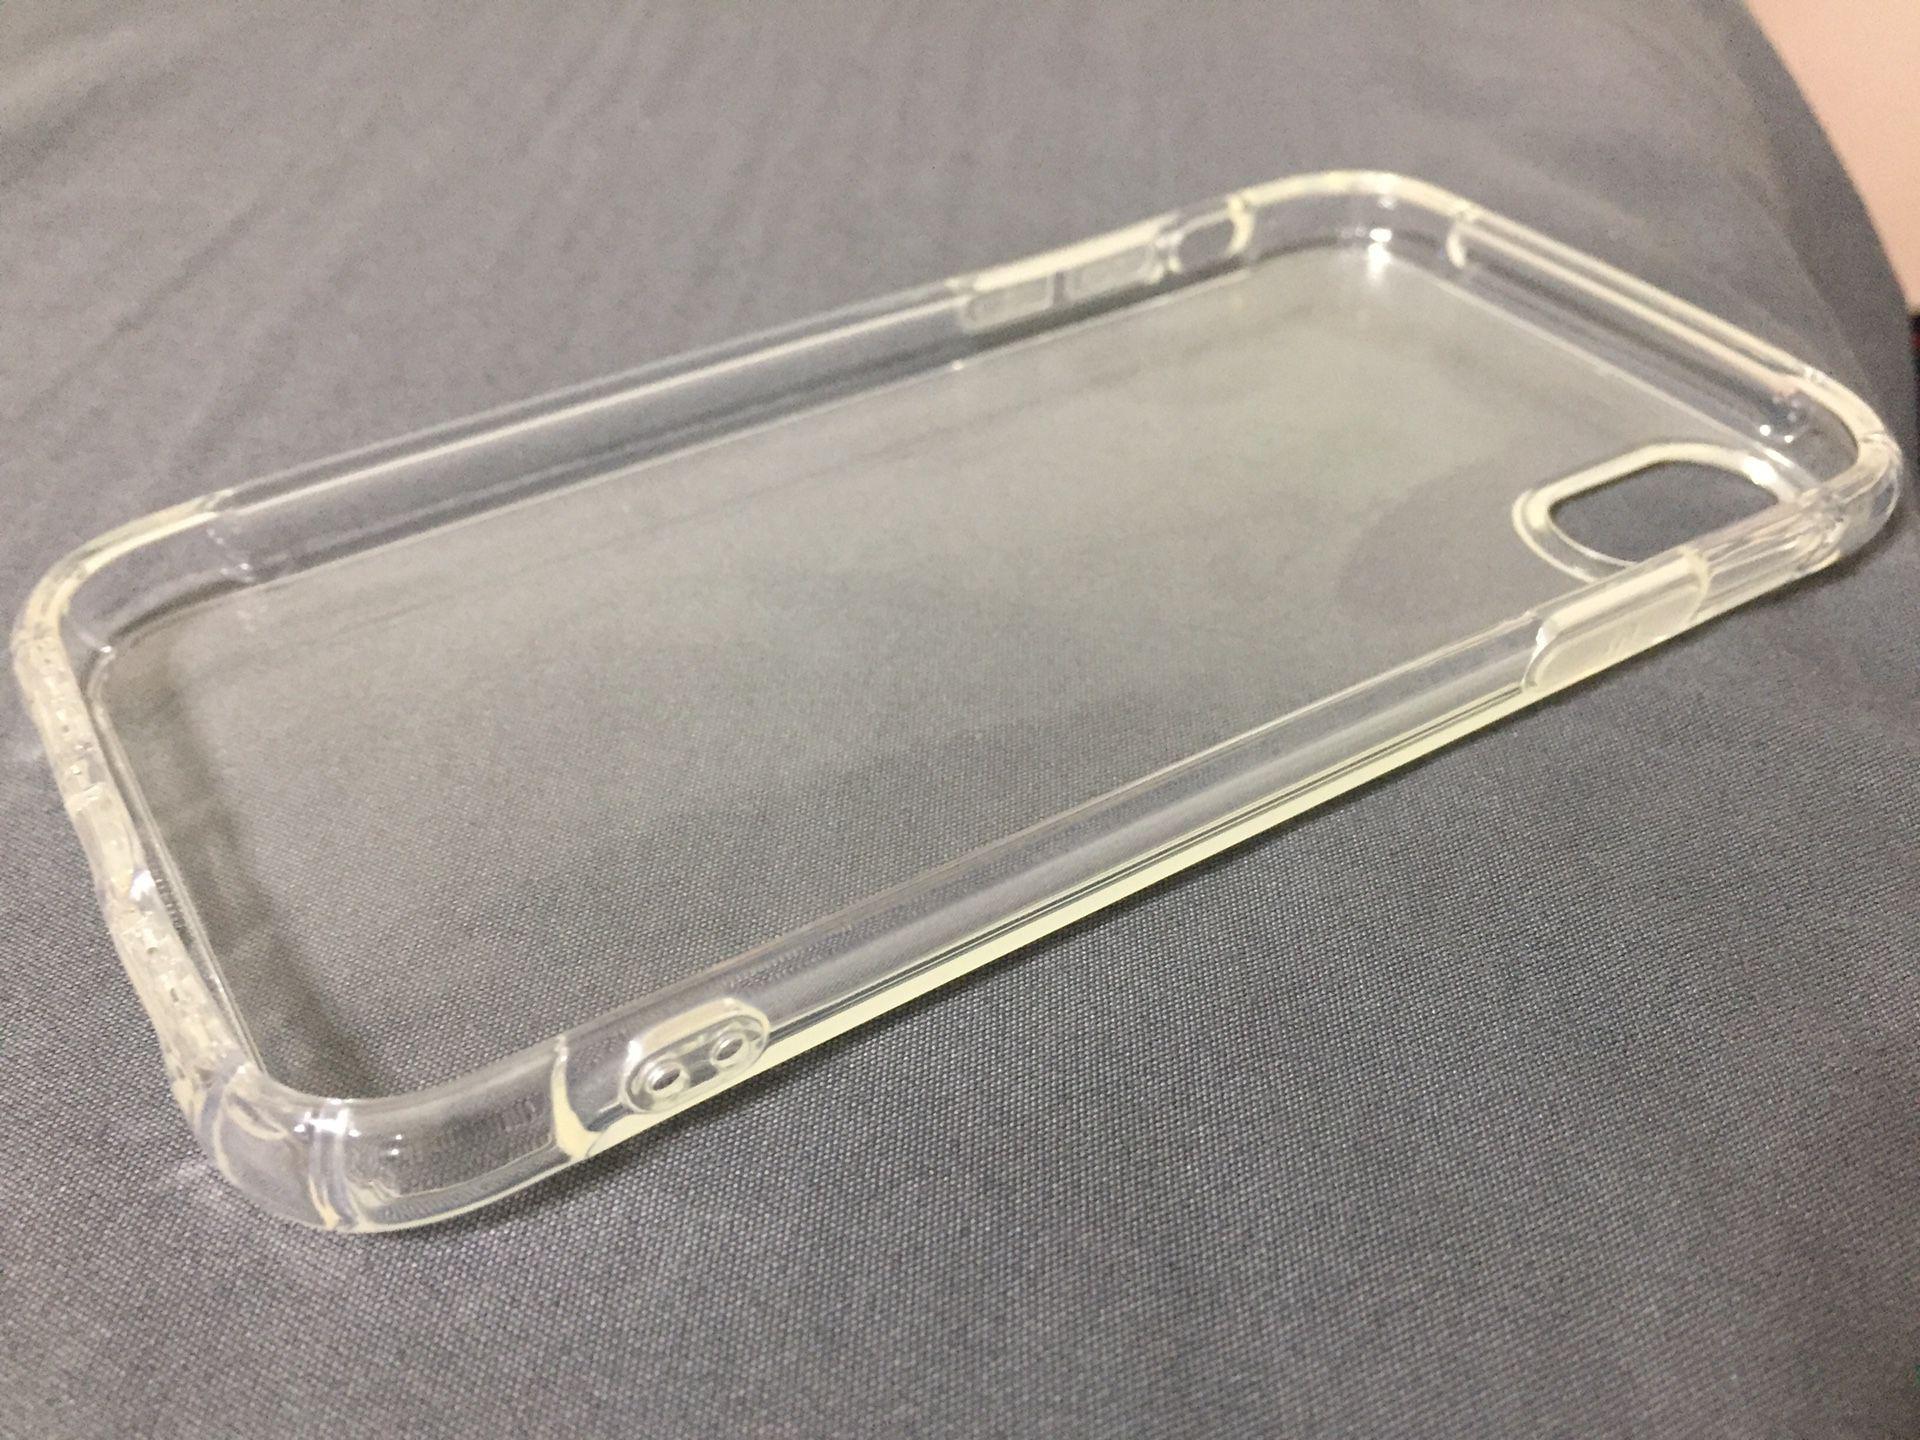 iPhone X /XS Max case